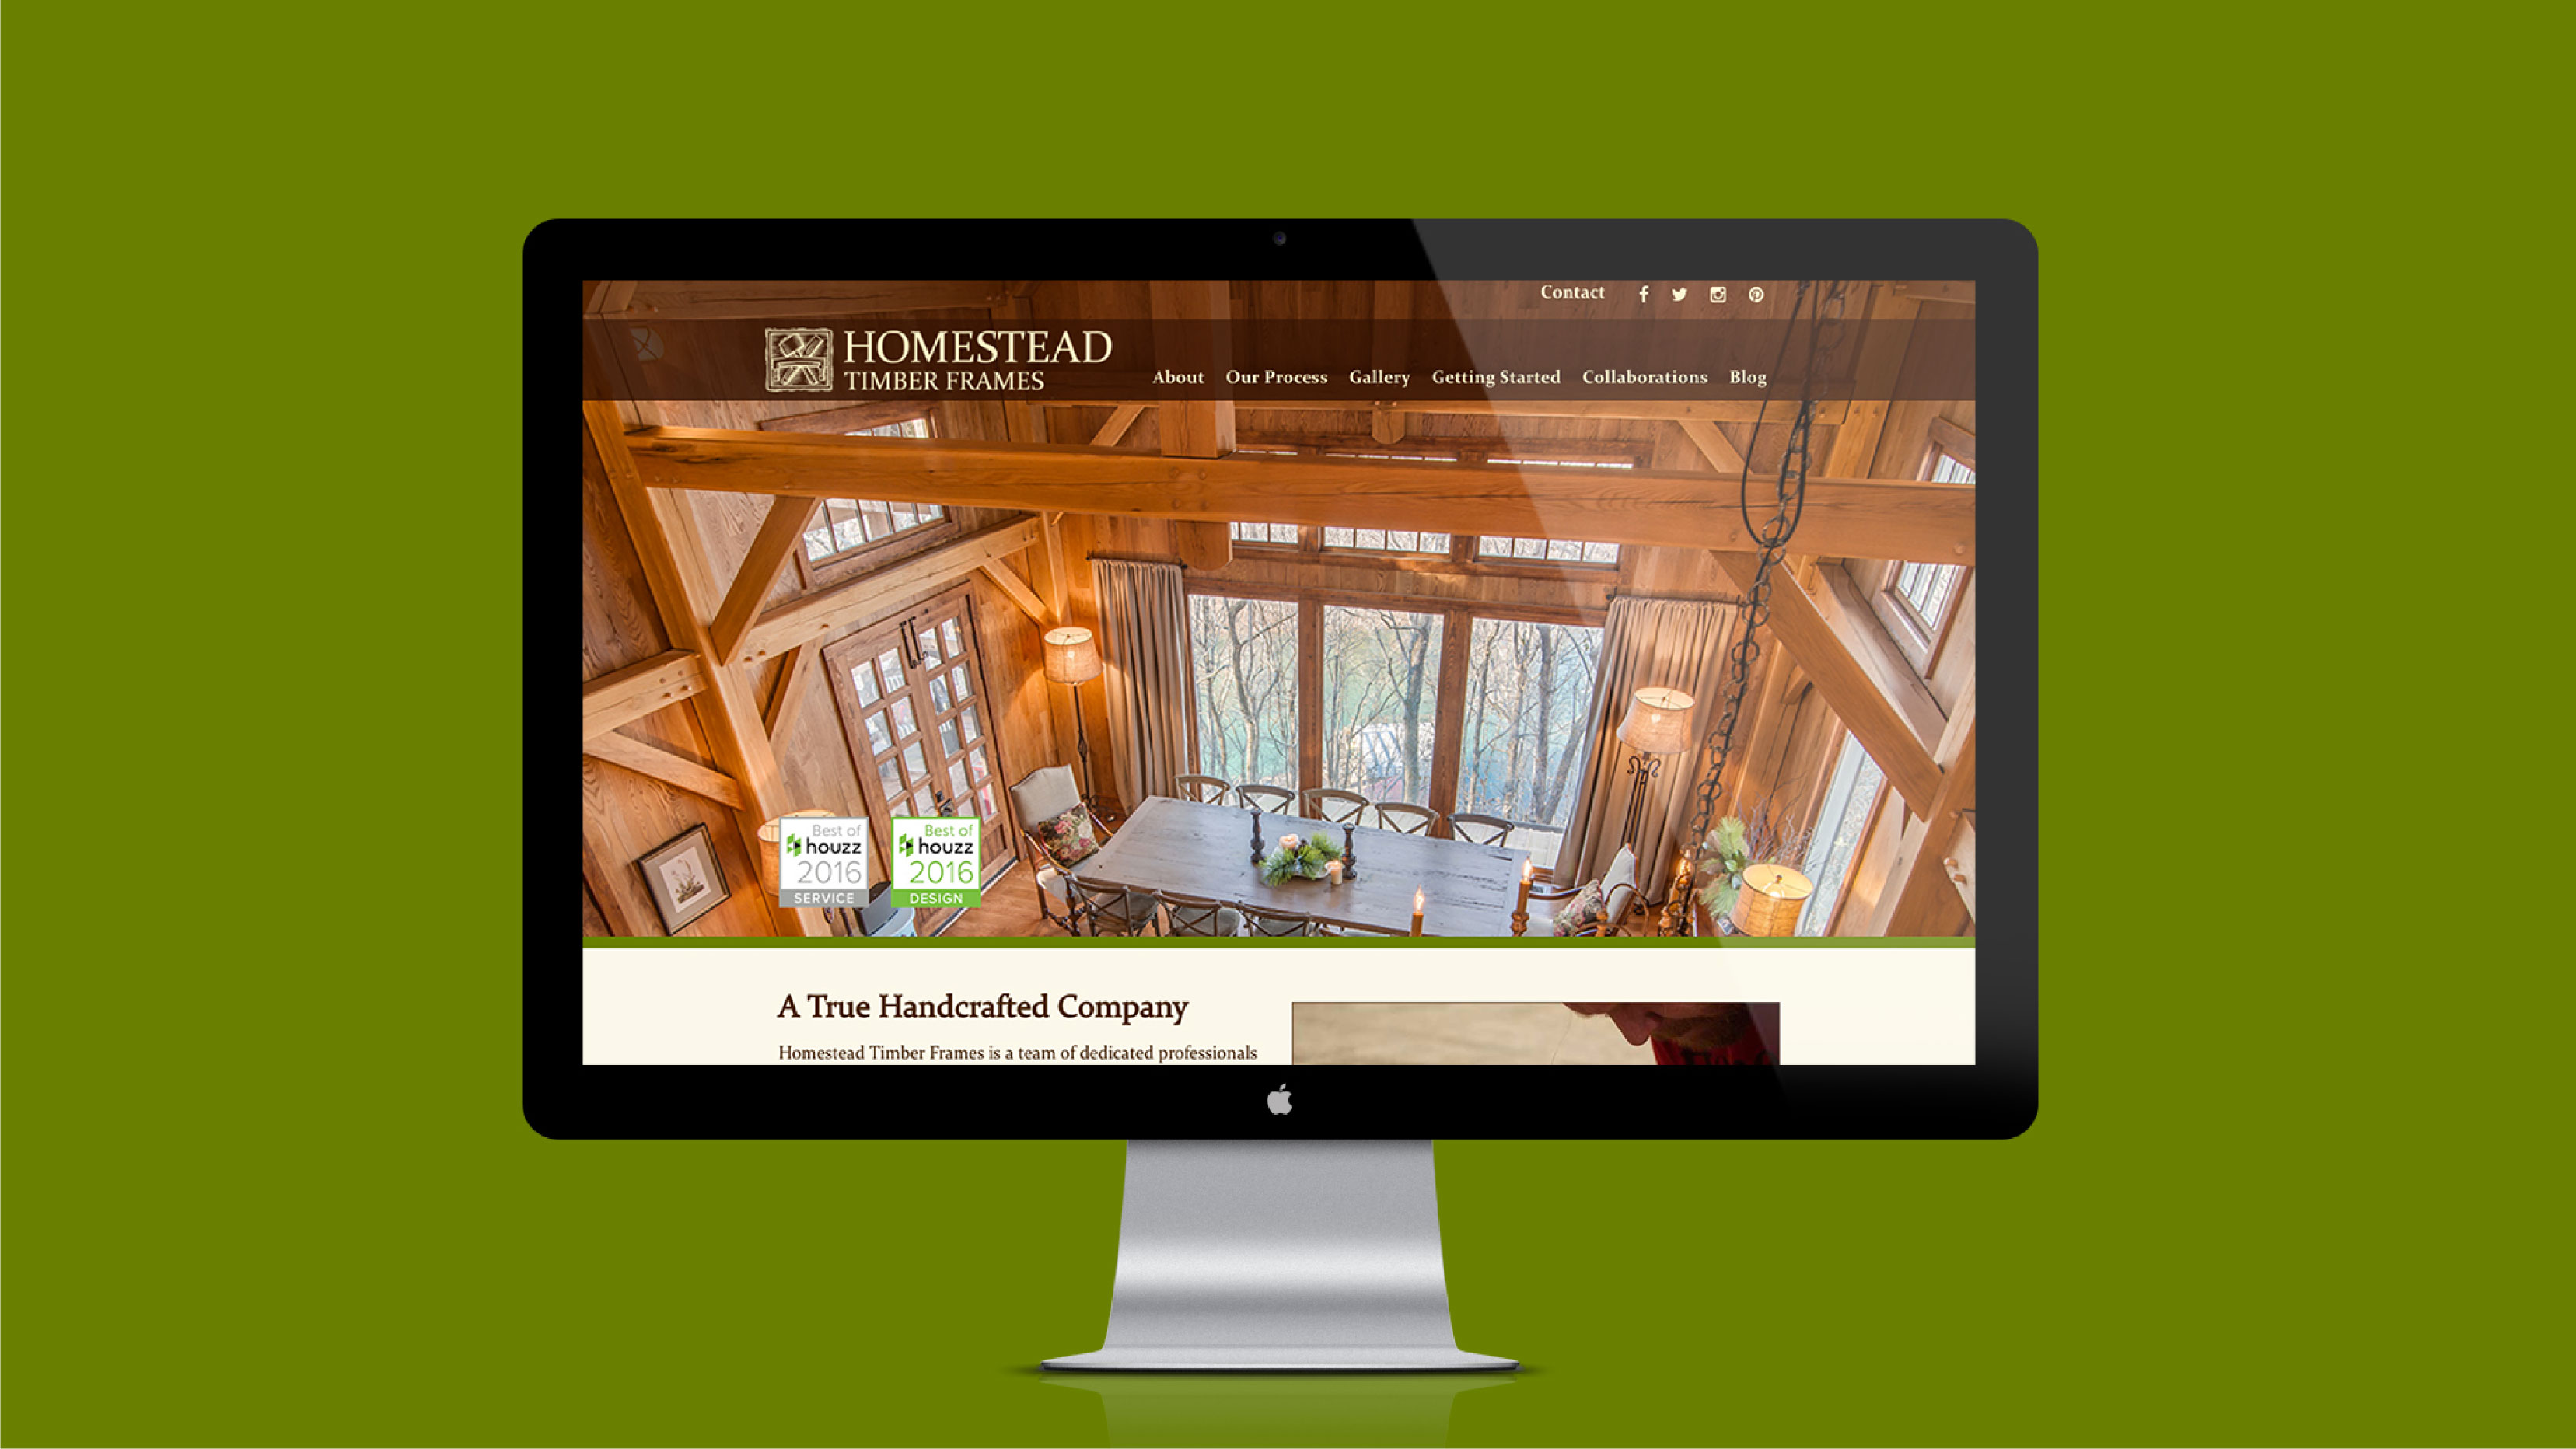 Homestead Timber frames